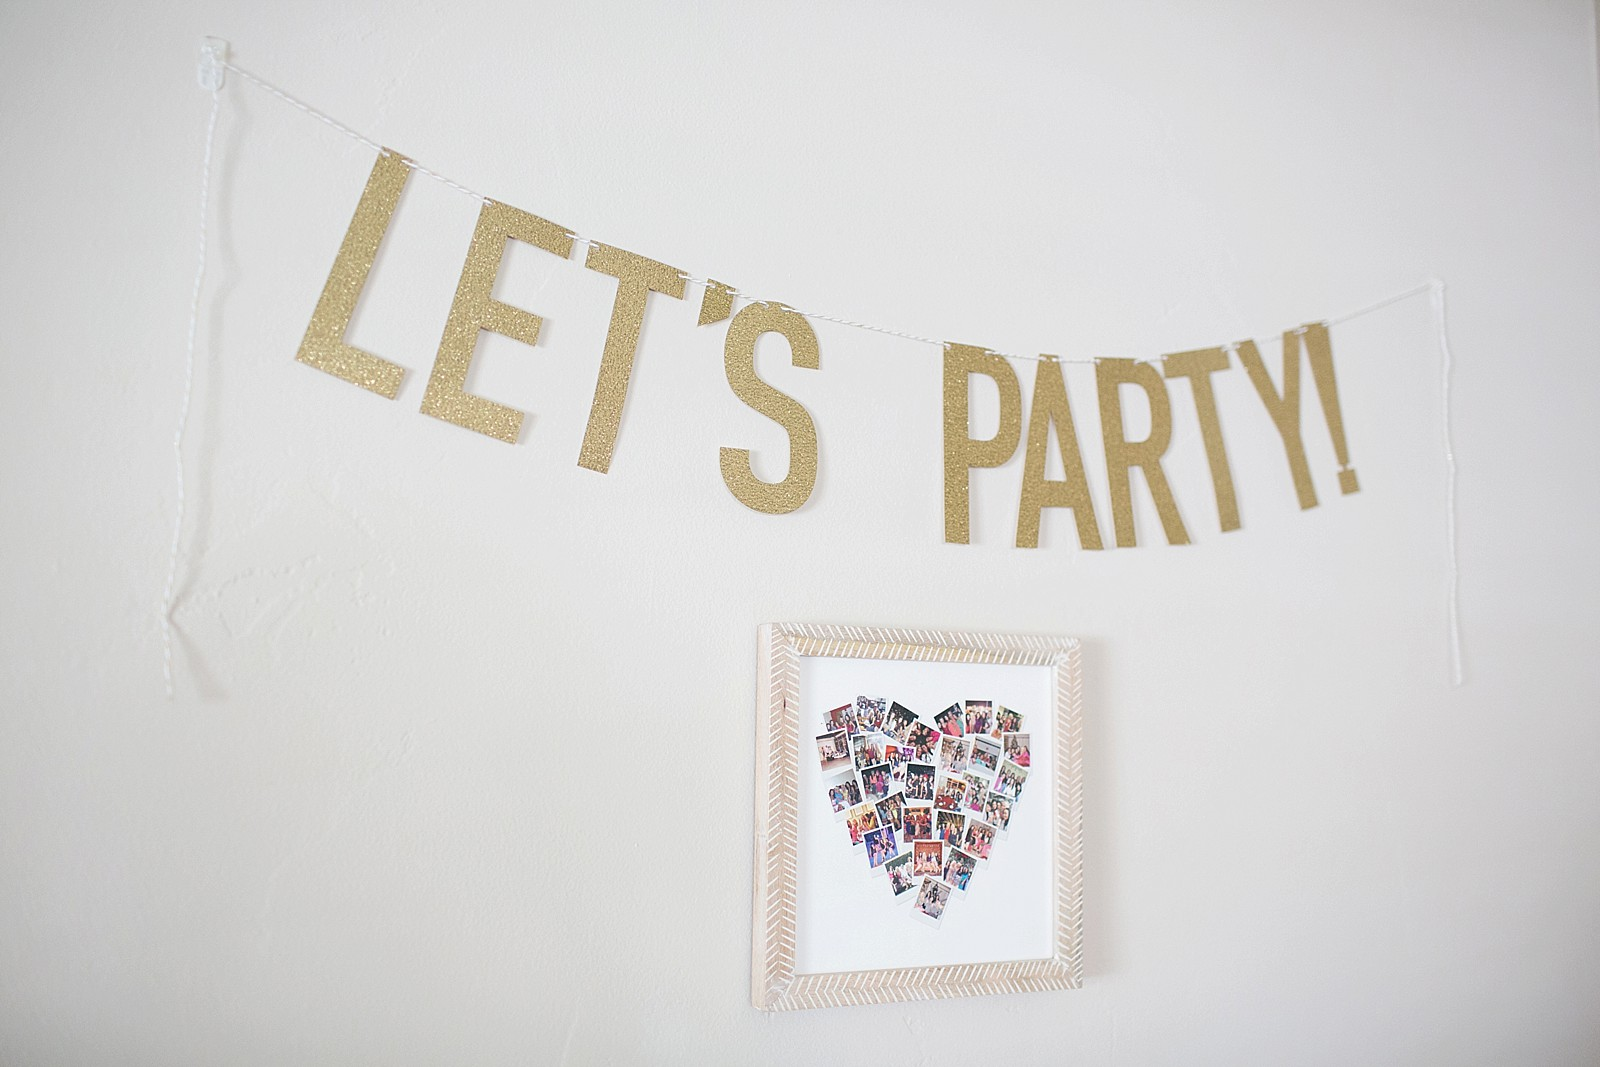 minted-christmas-inspiration-girls-party-photos-diana-elizabeth-blog-lifestyle-hostess-entertainment-home-blog-2308